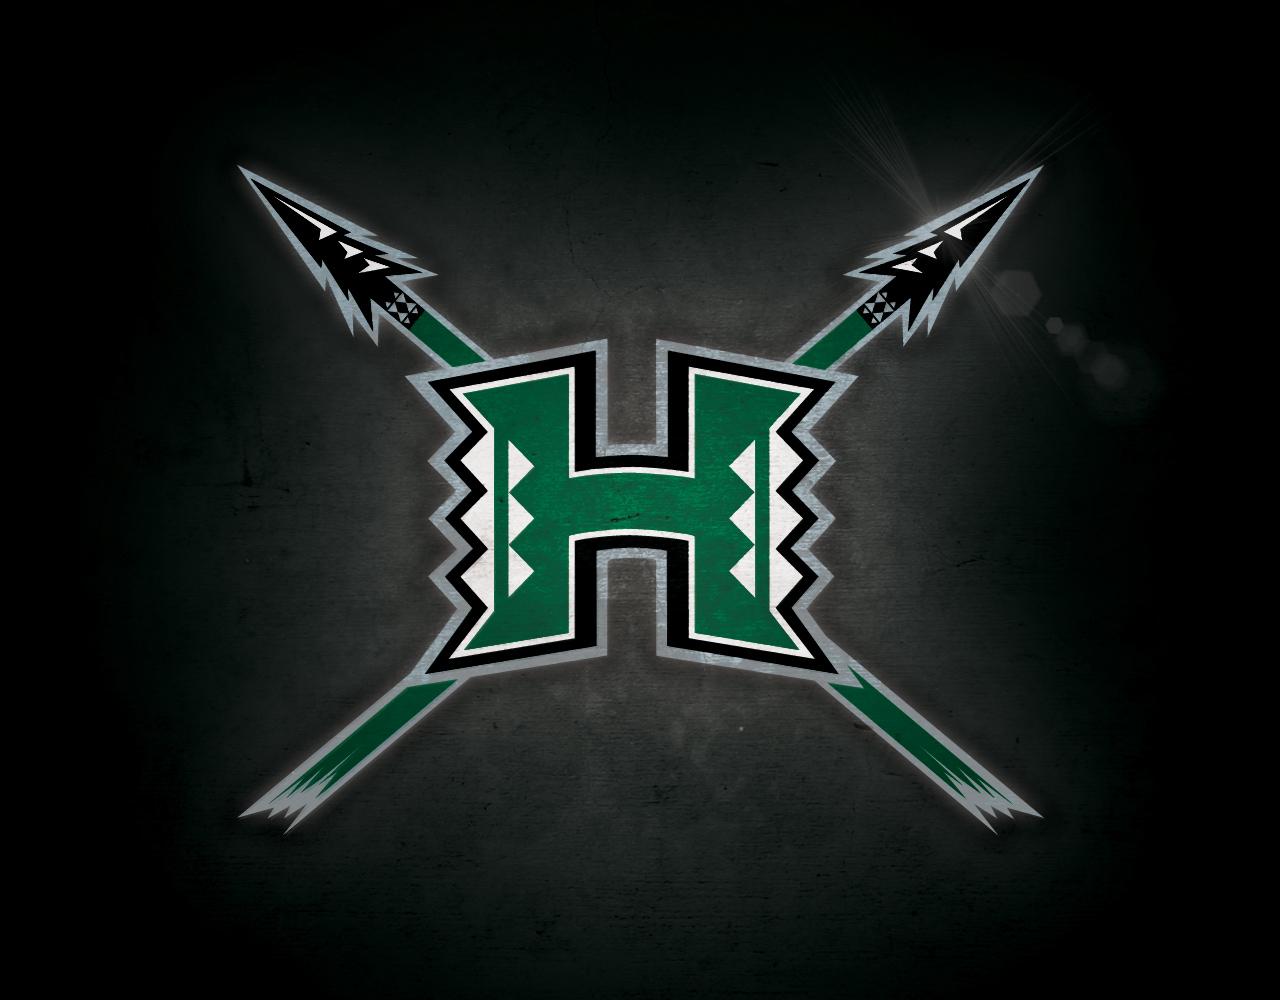 university of hawaii logo 1280x1000